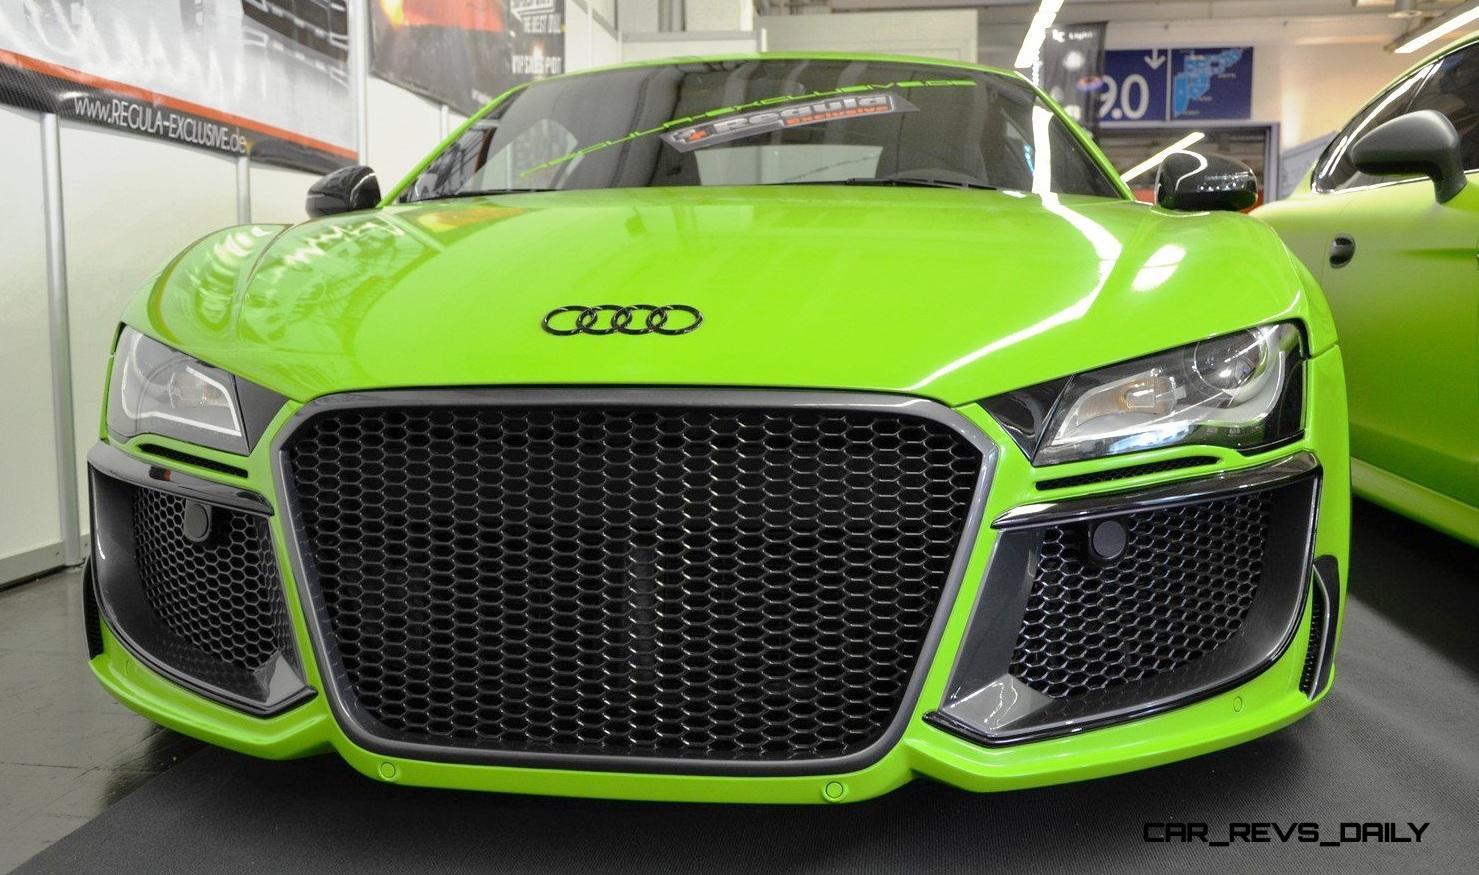 REGULA EXCLUSIVE Bodykits for Audi R8, Porsche Panamera and